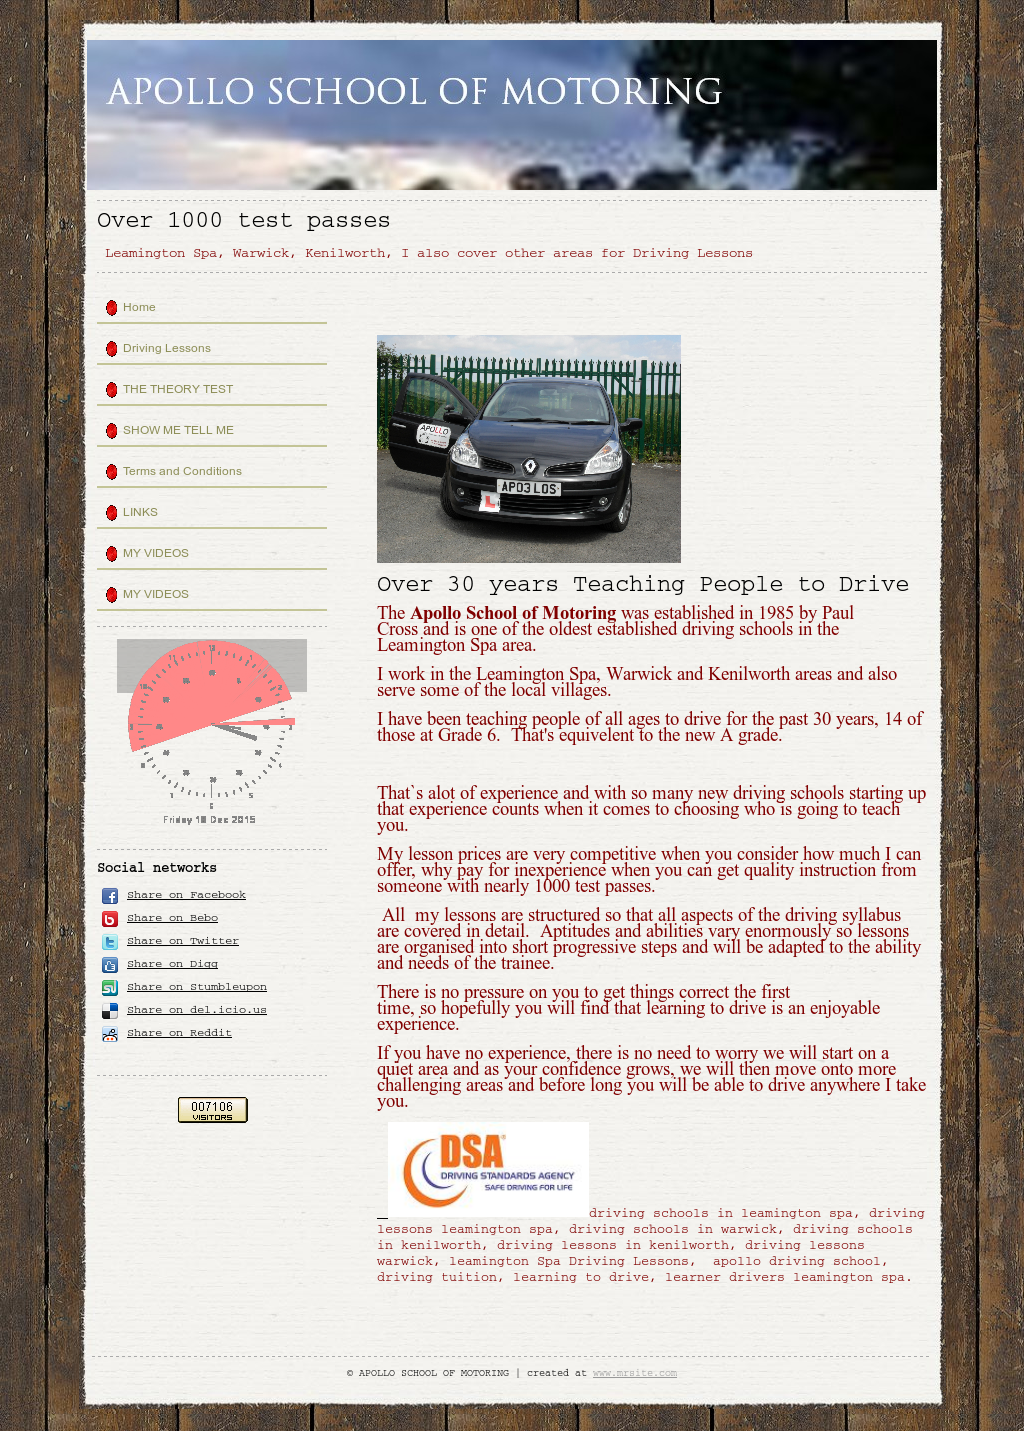 Apollo School Of Motoring Competitors, Revenue and Employees